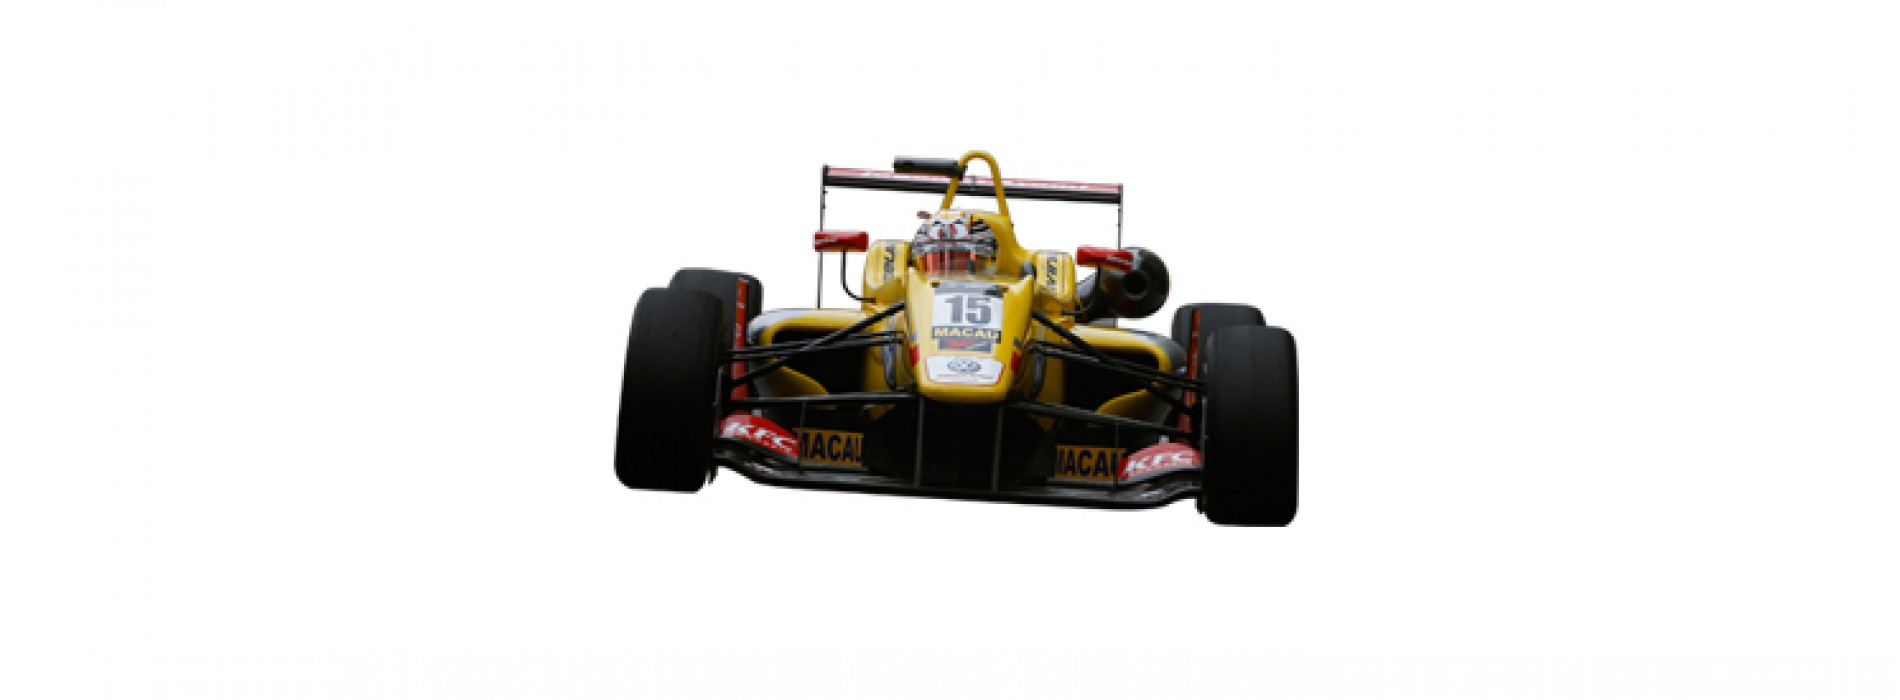 The 62nd Macau Grand Prix to take over the Streets of Macau on 19th – 22nd November 2015